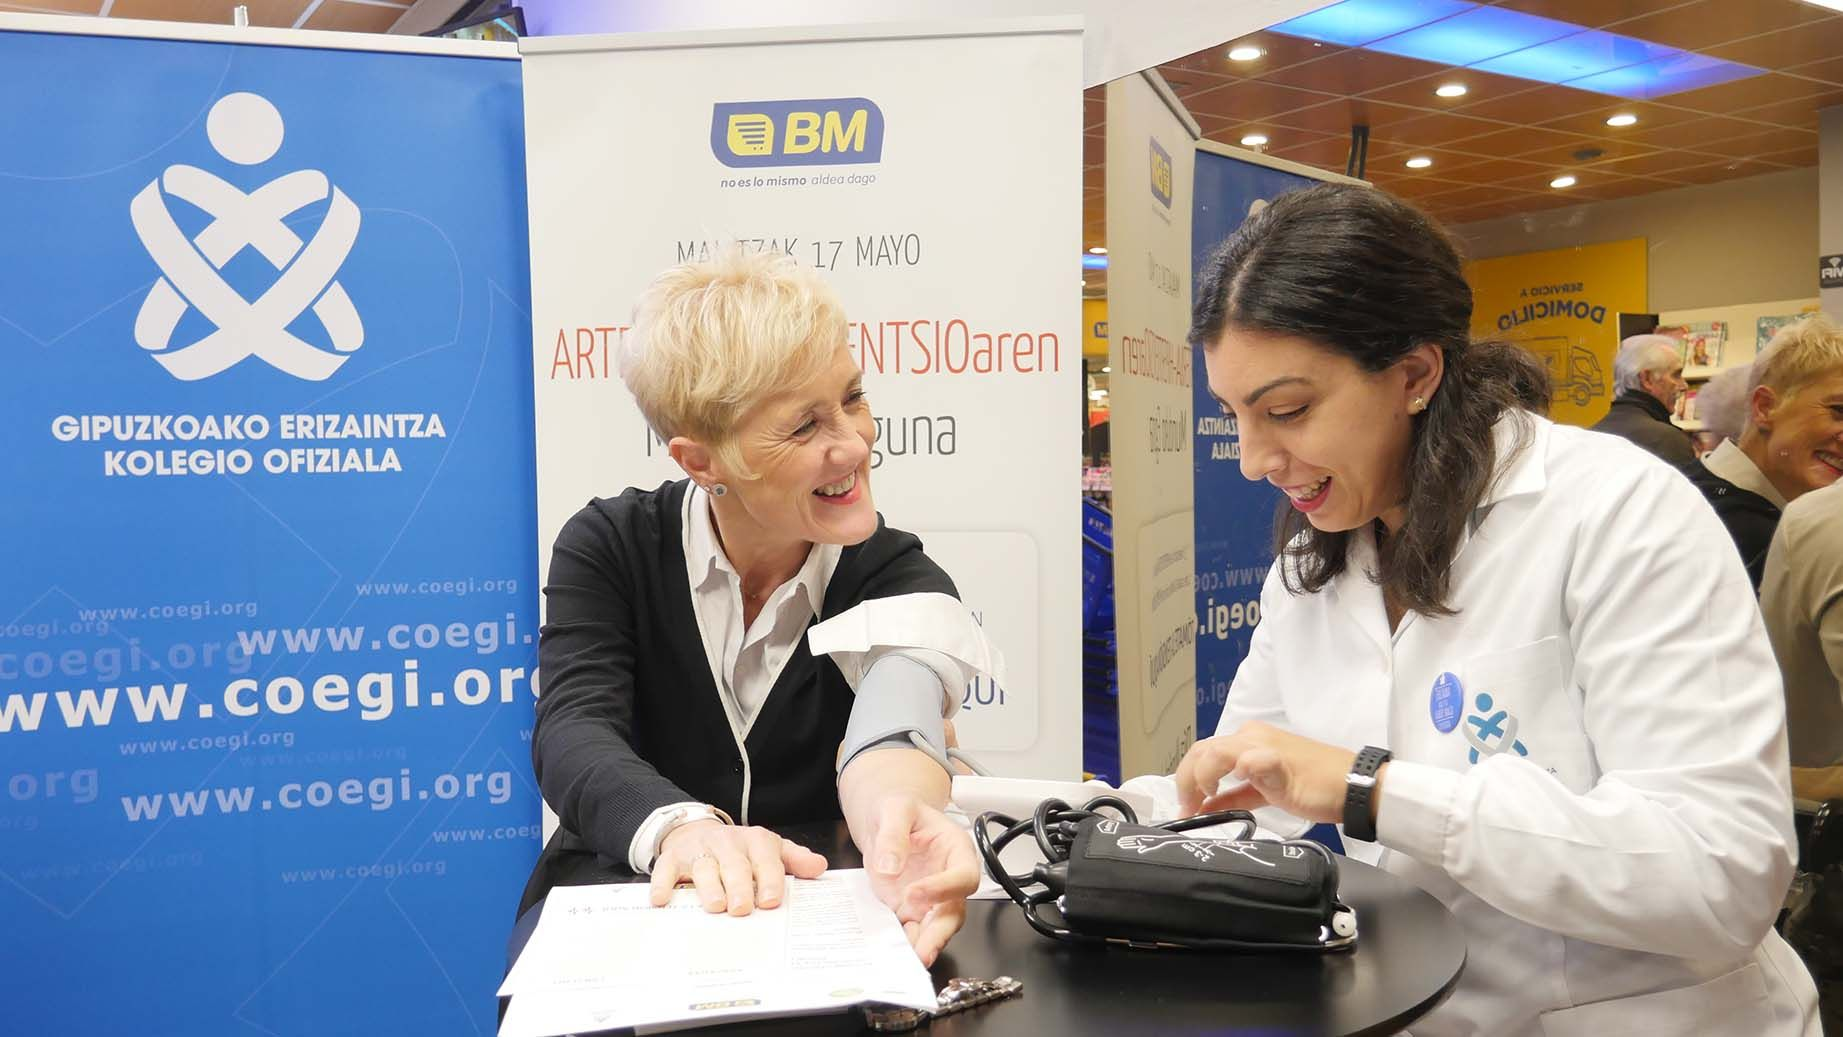 Foto de La presidenta del COEGI, Pilar Lecuona, junto a la enfermera